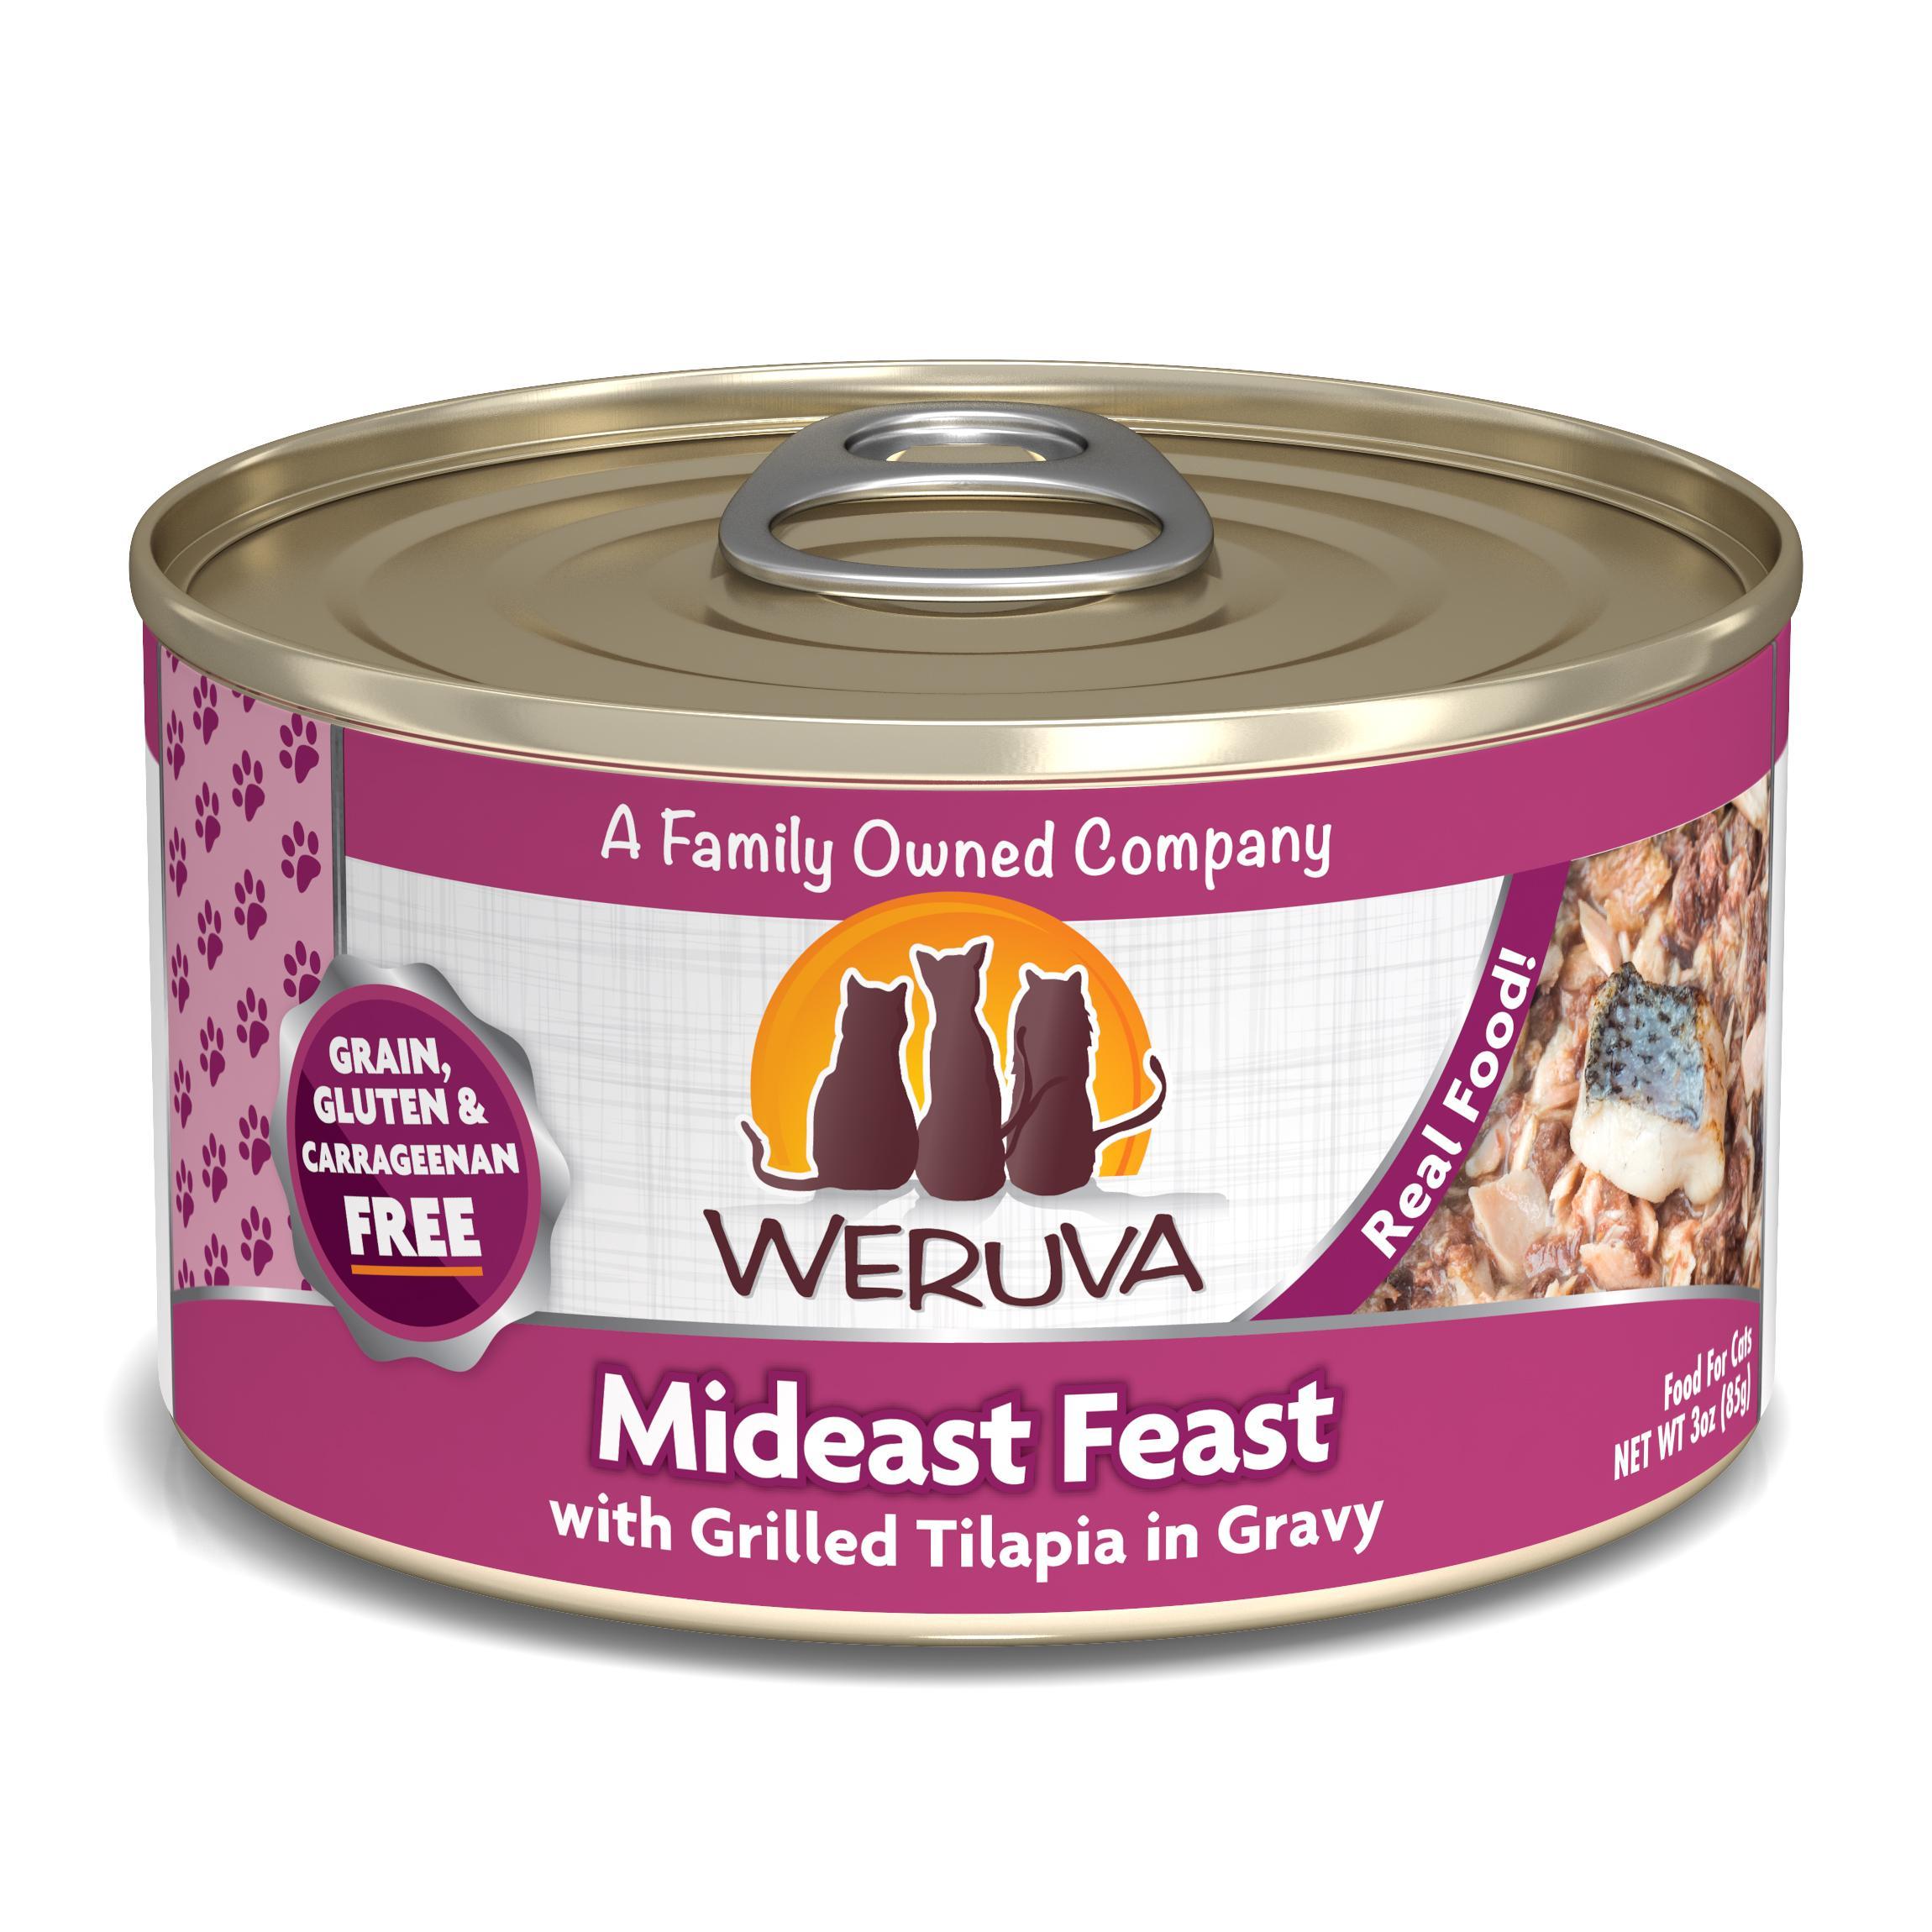 Weruva Cat Classic Mideast Feast with Grilled Tilapia in Gravy Grain-Free Wet Cat Food, 3-oz